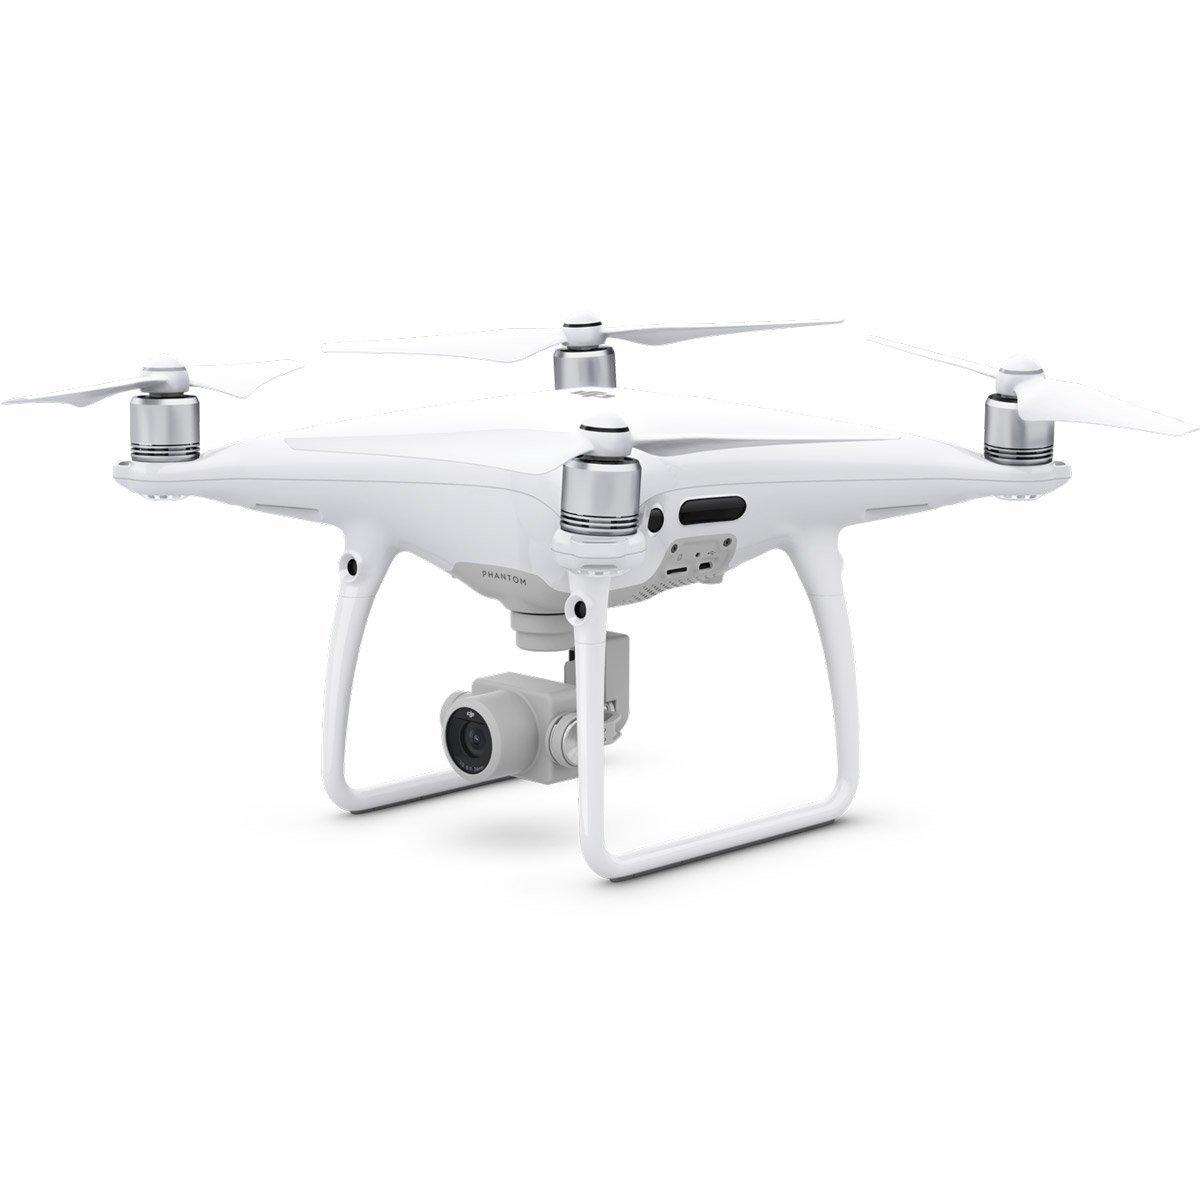 DJI Phantom 4 Pro Drone (Certified Refurbished) 4K HD Video -  White VisionUp Global Ca CP.PT.000488.E